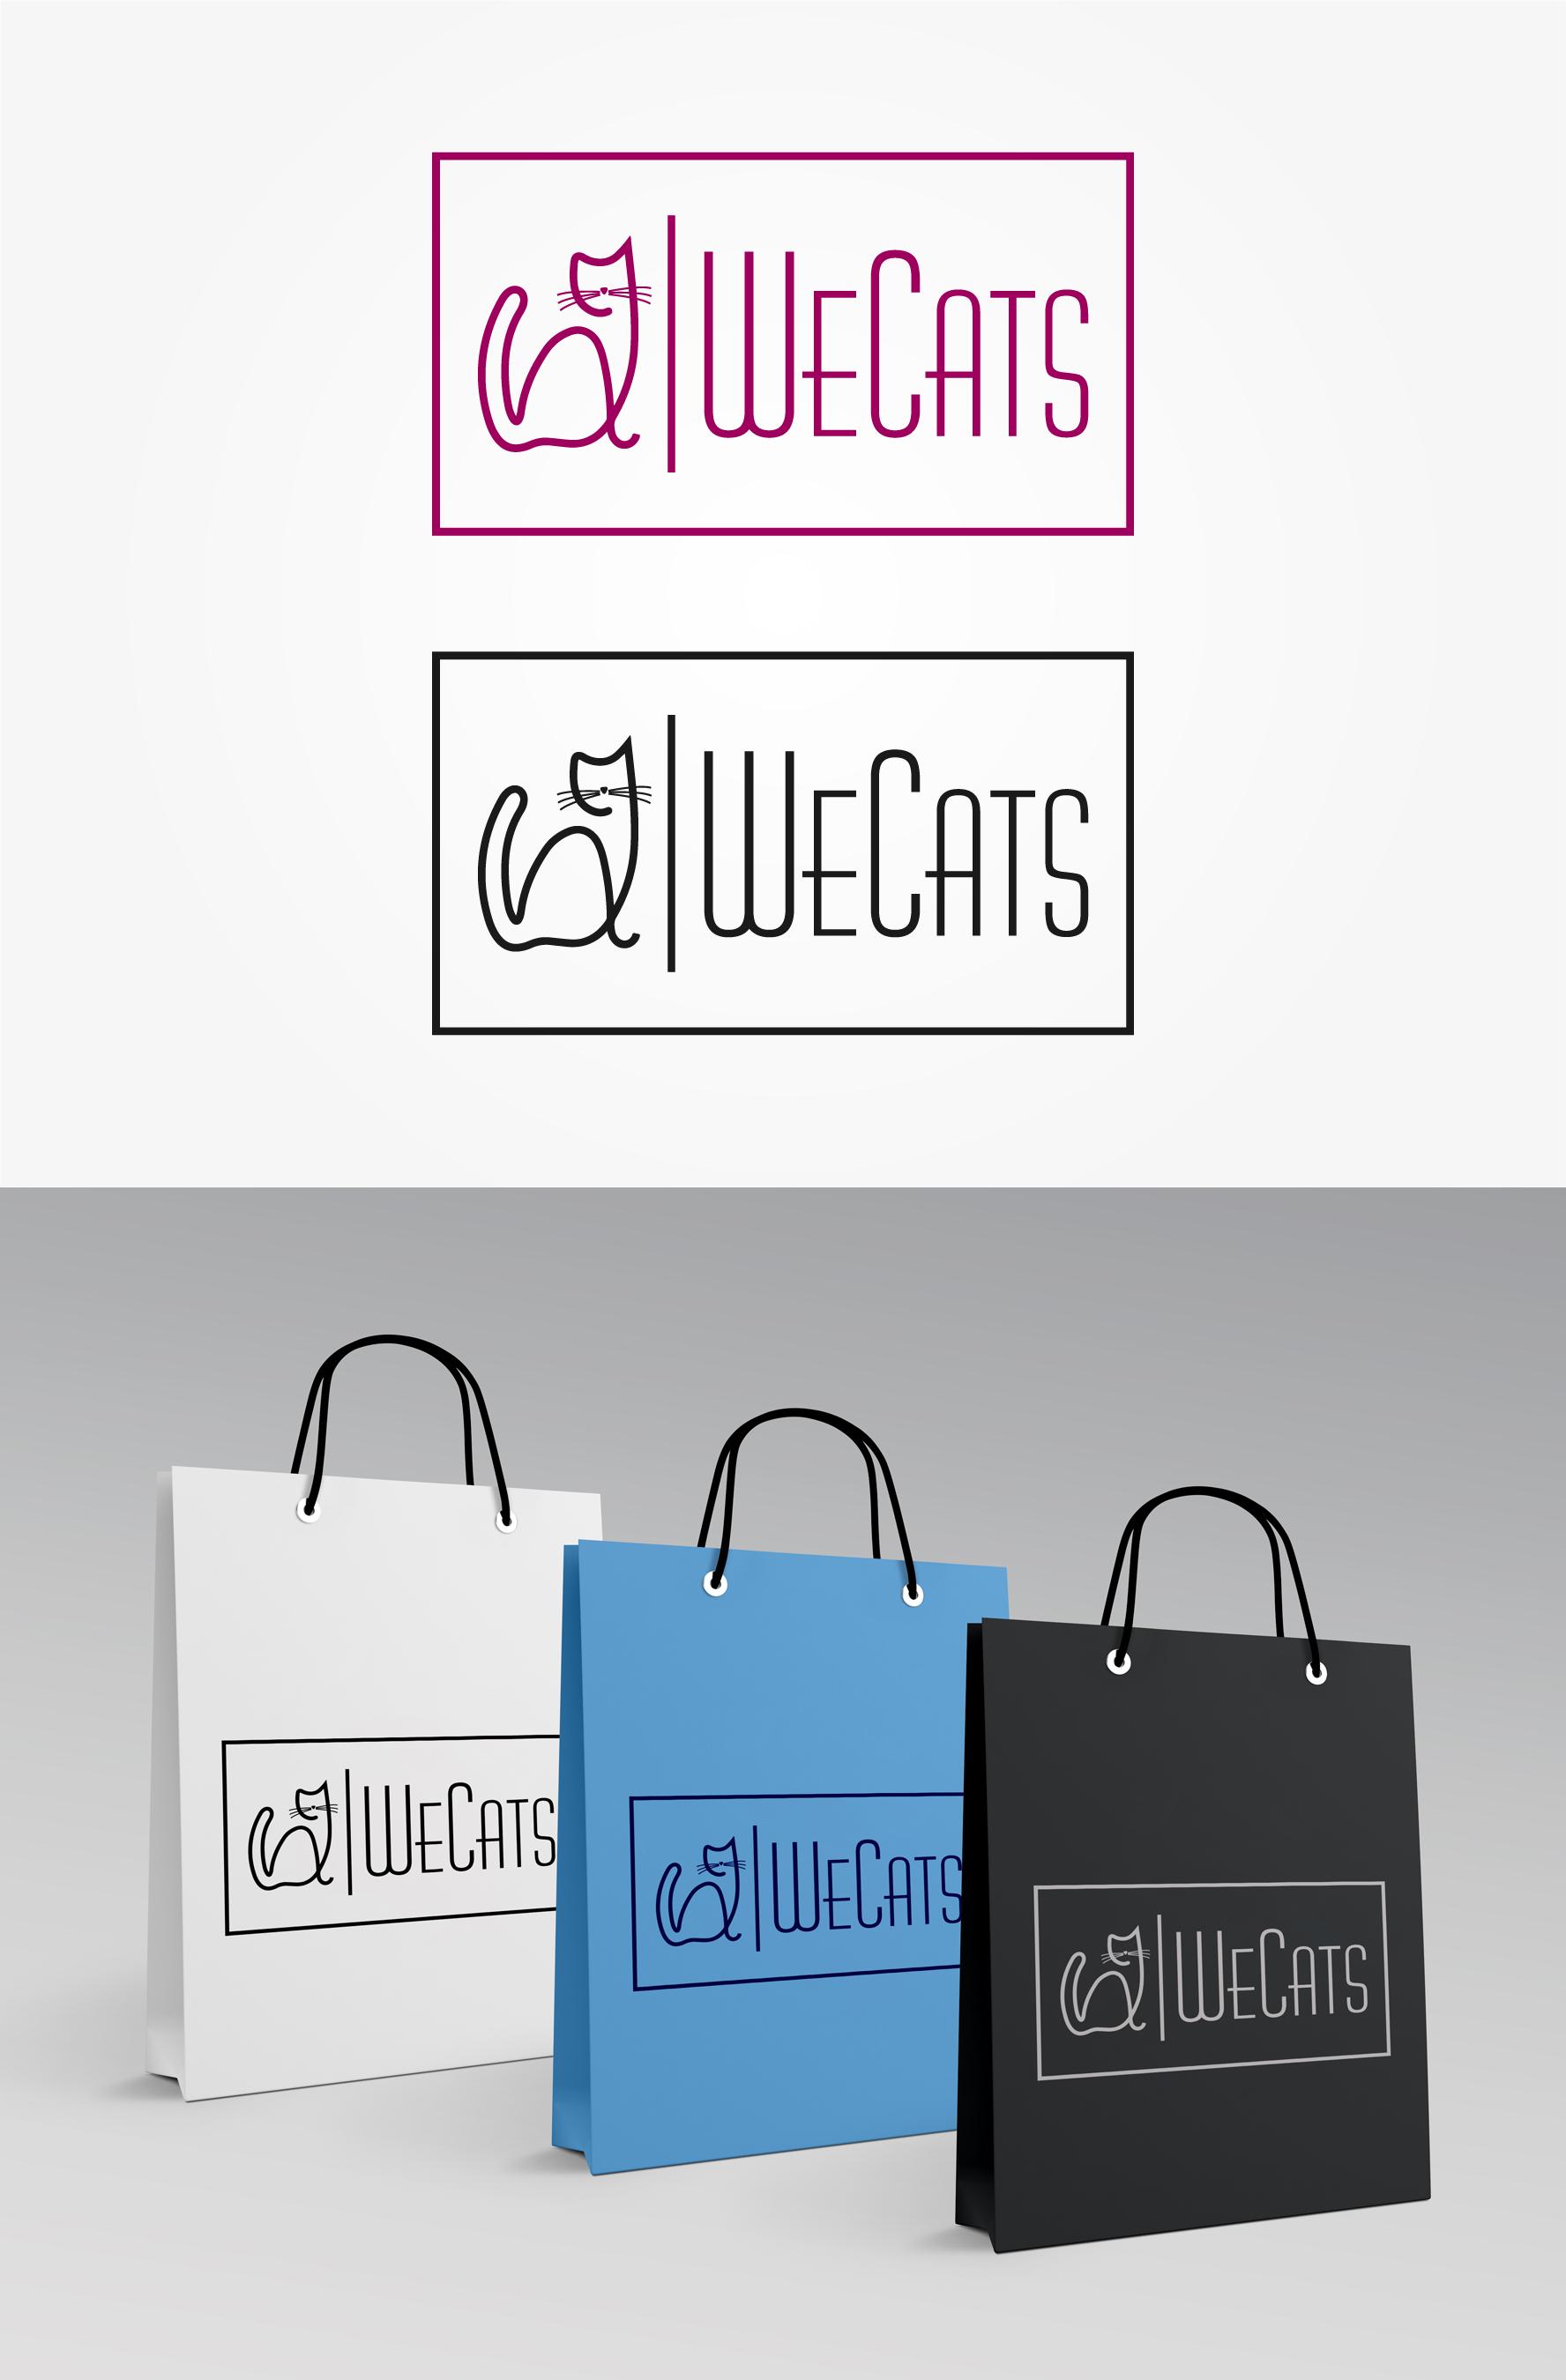 Создание логотипа WeCats фото f_1515f188f7c406b9.jpg